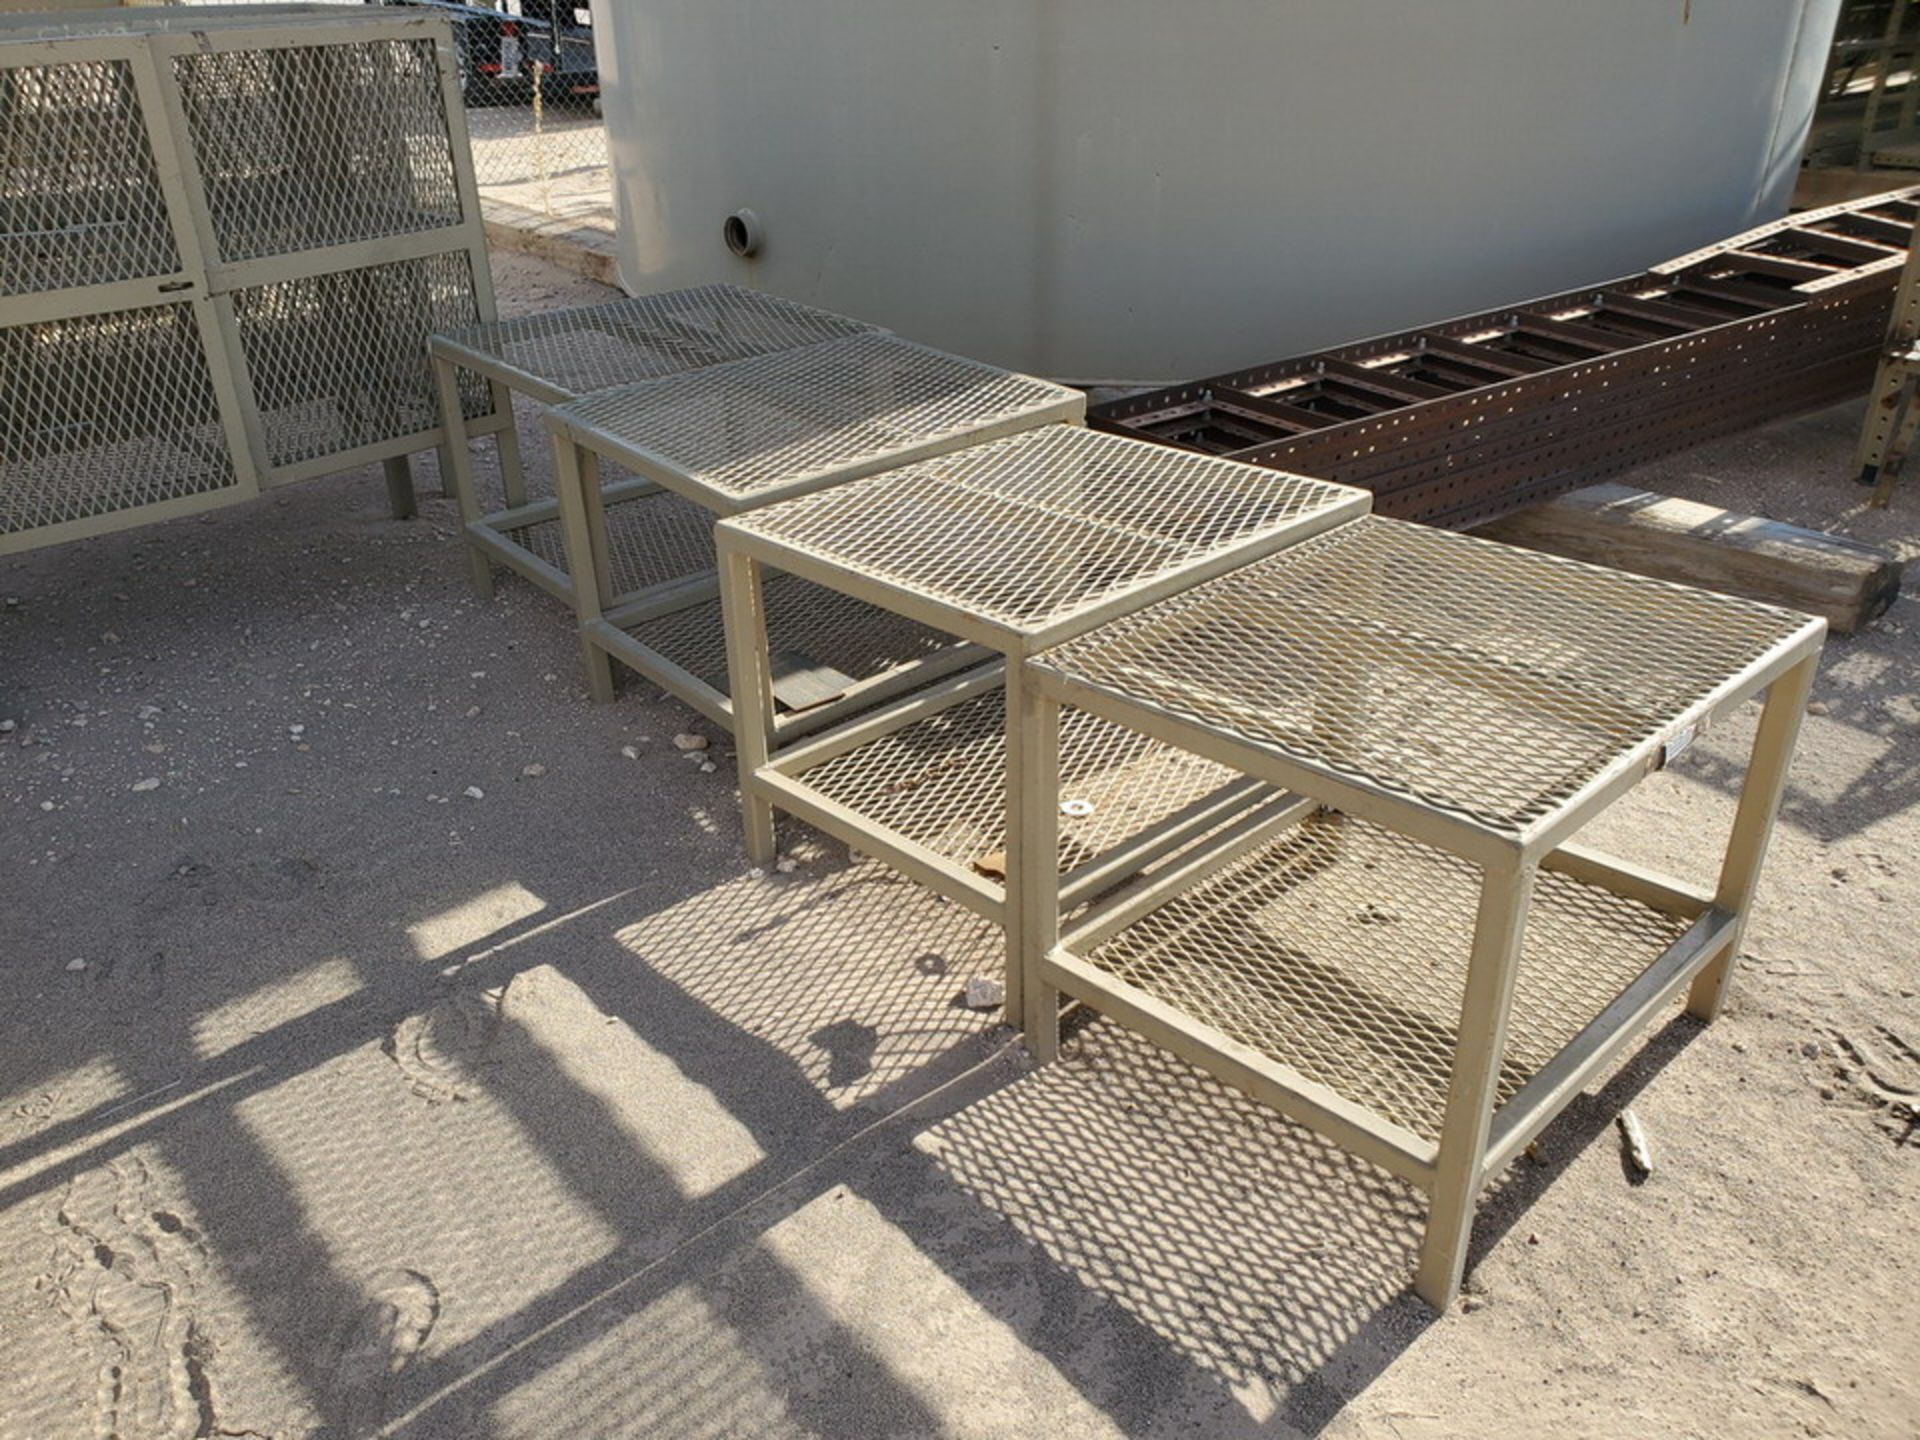 "Assorted Stl Matl. Racks & Ladders Size Range: 30"" x 26"" x 25""H - 29"" x 48"" x 50""H - Image 5 of 18"